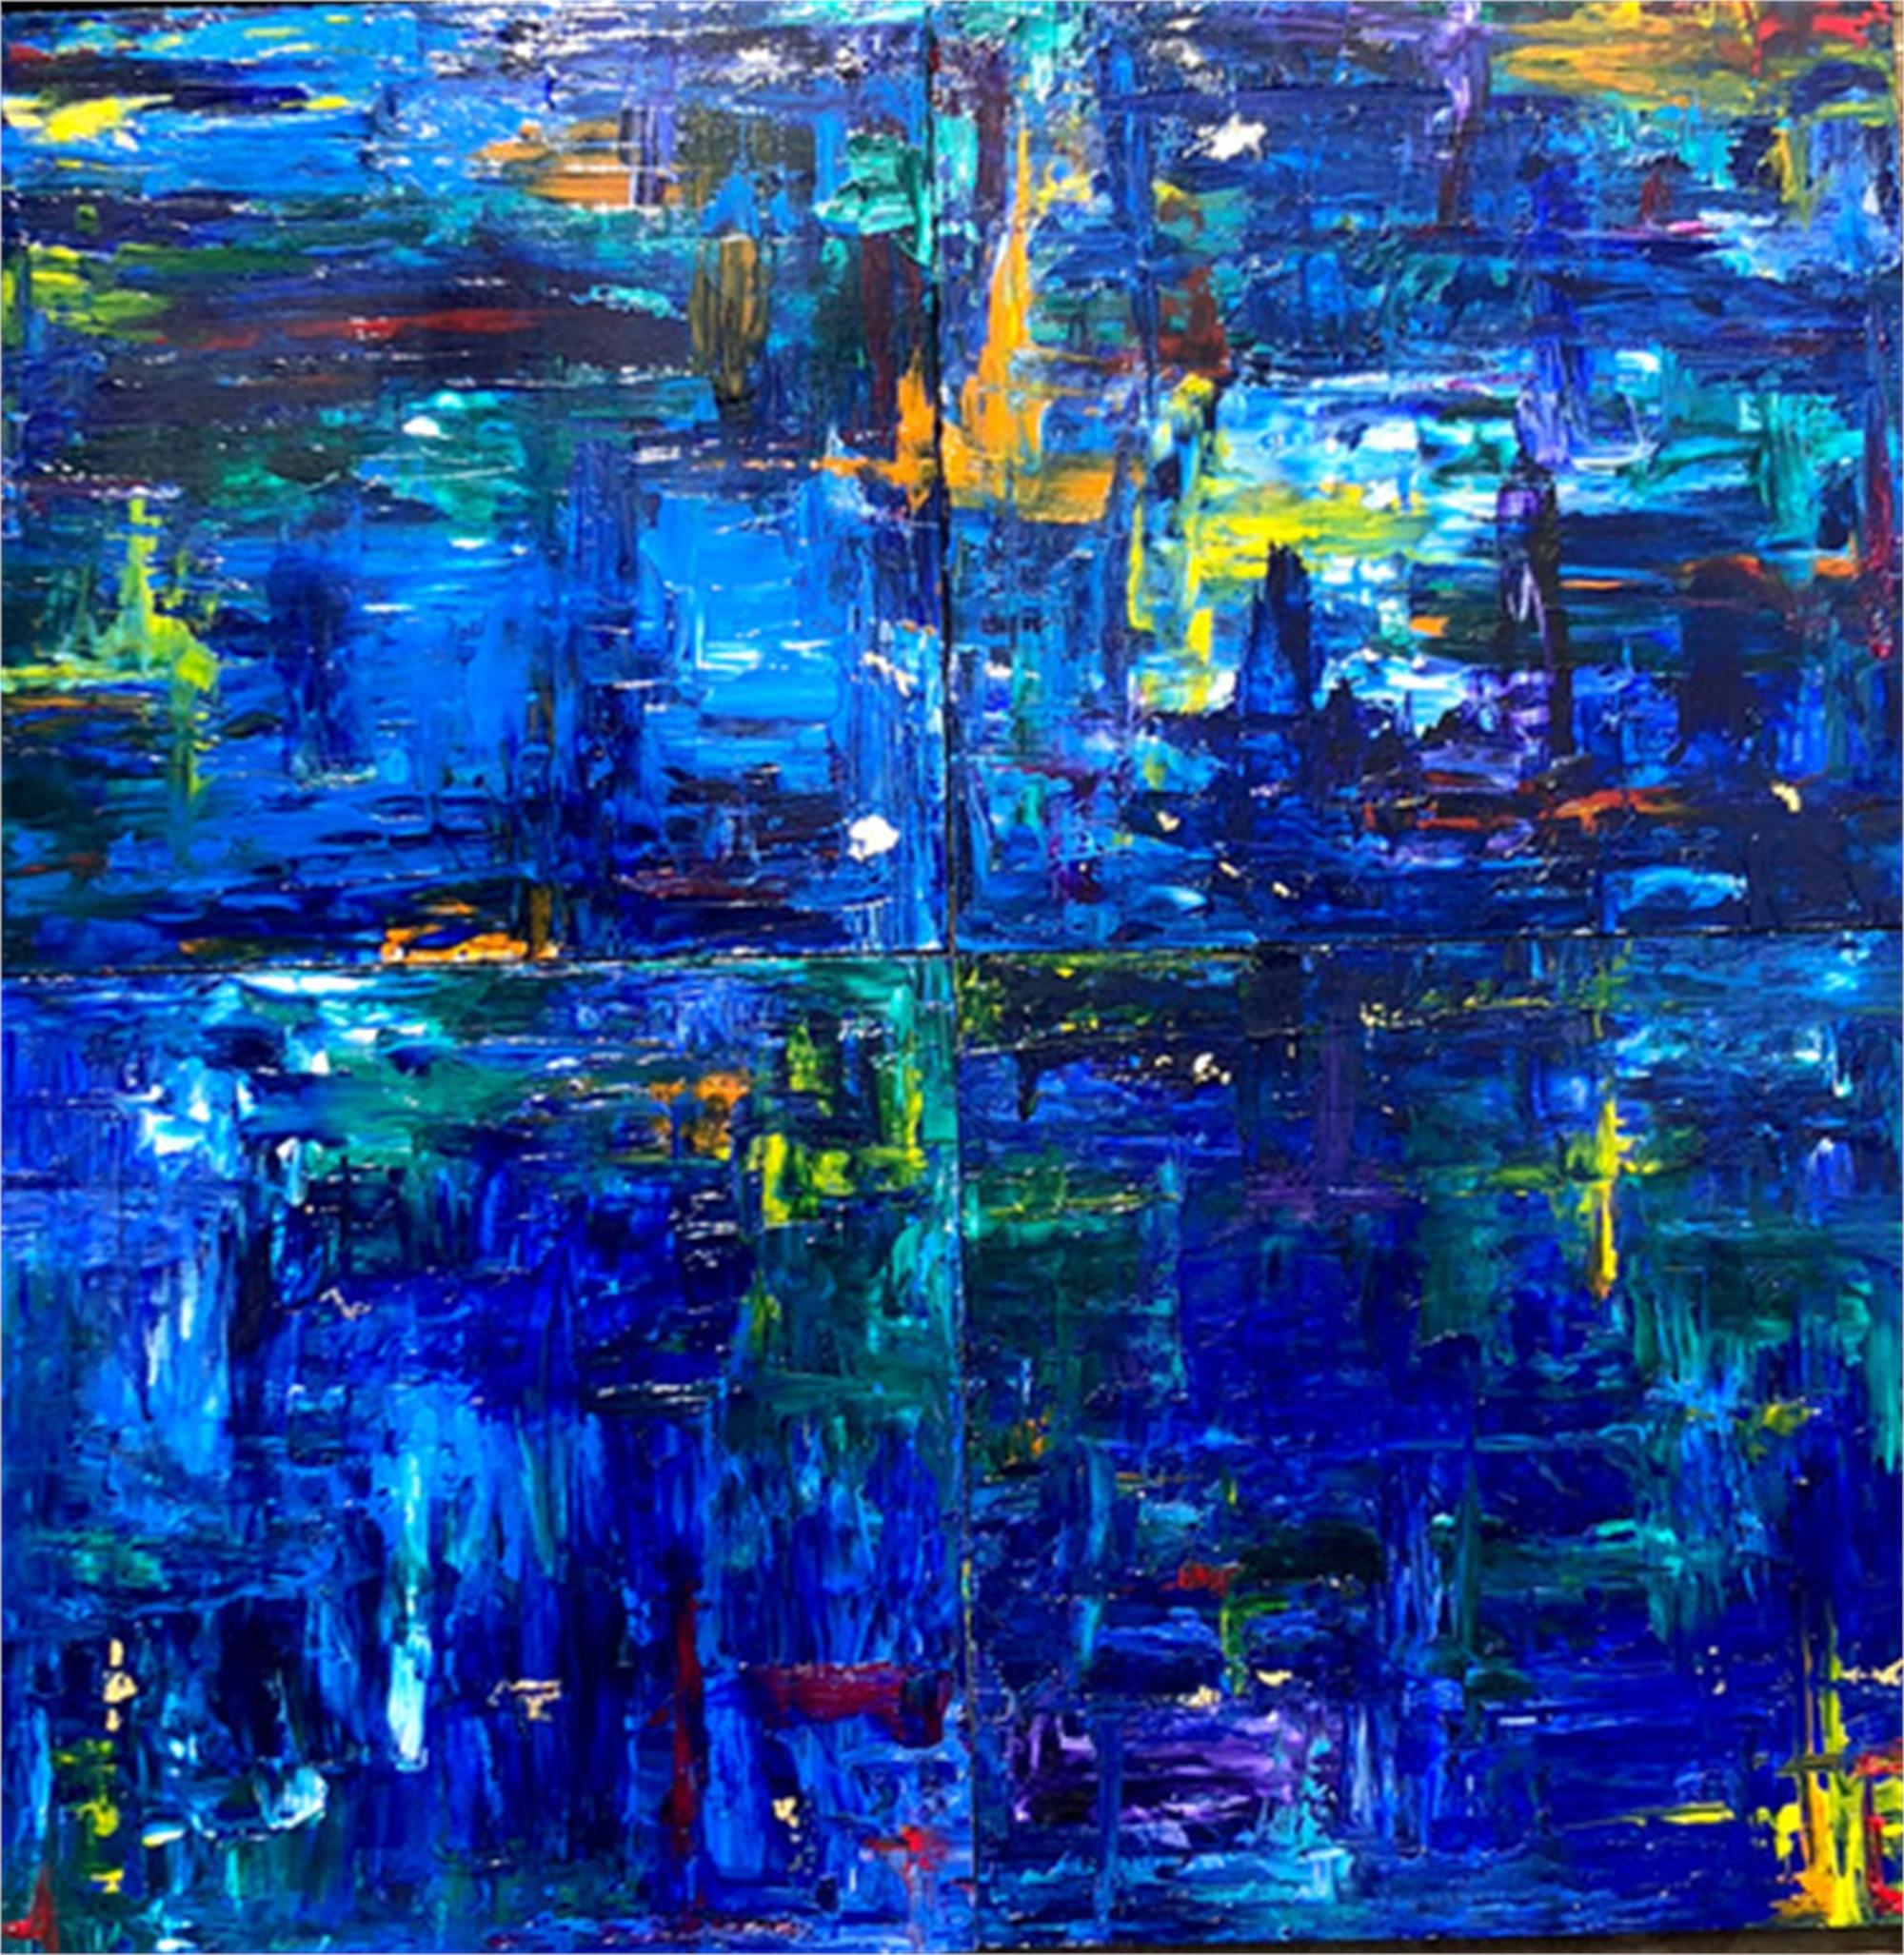 Rain in the City by Andrea Kreeger